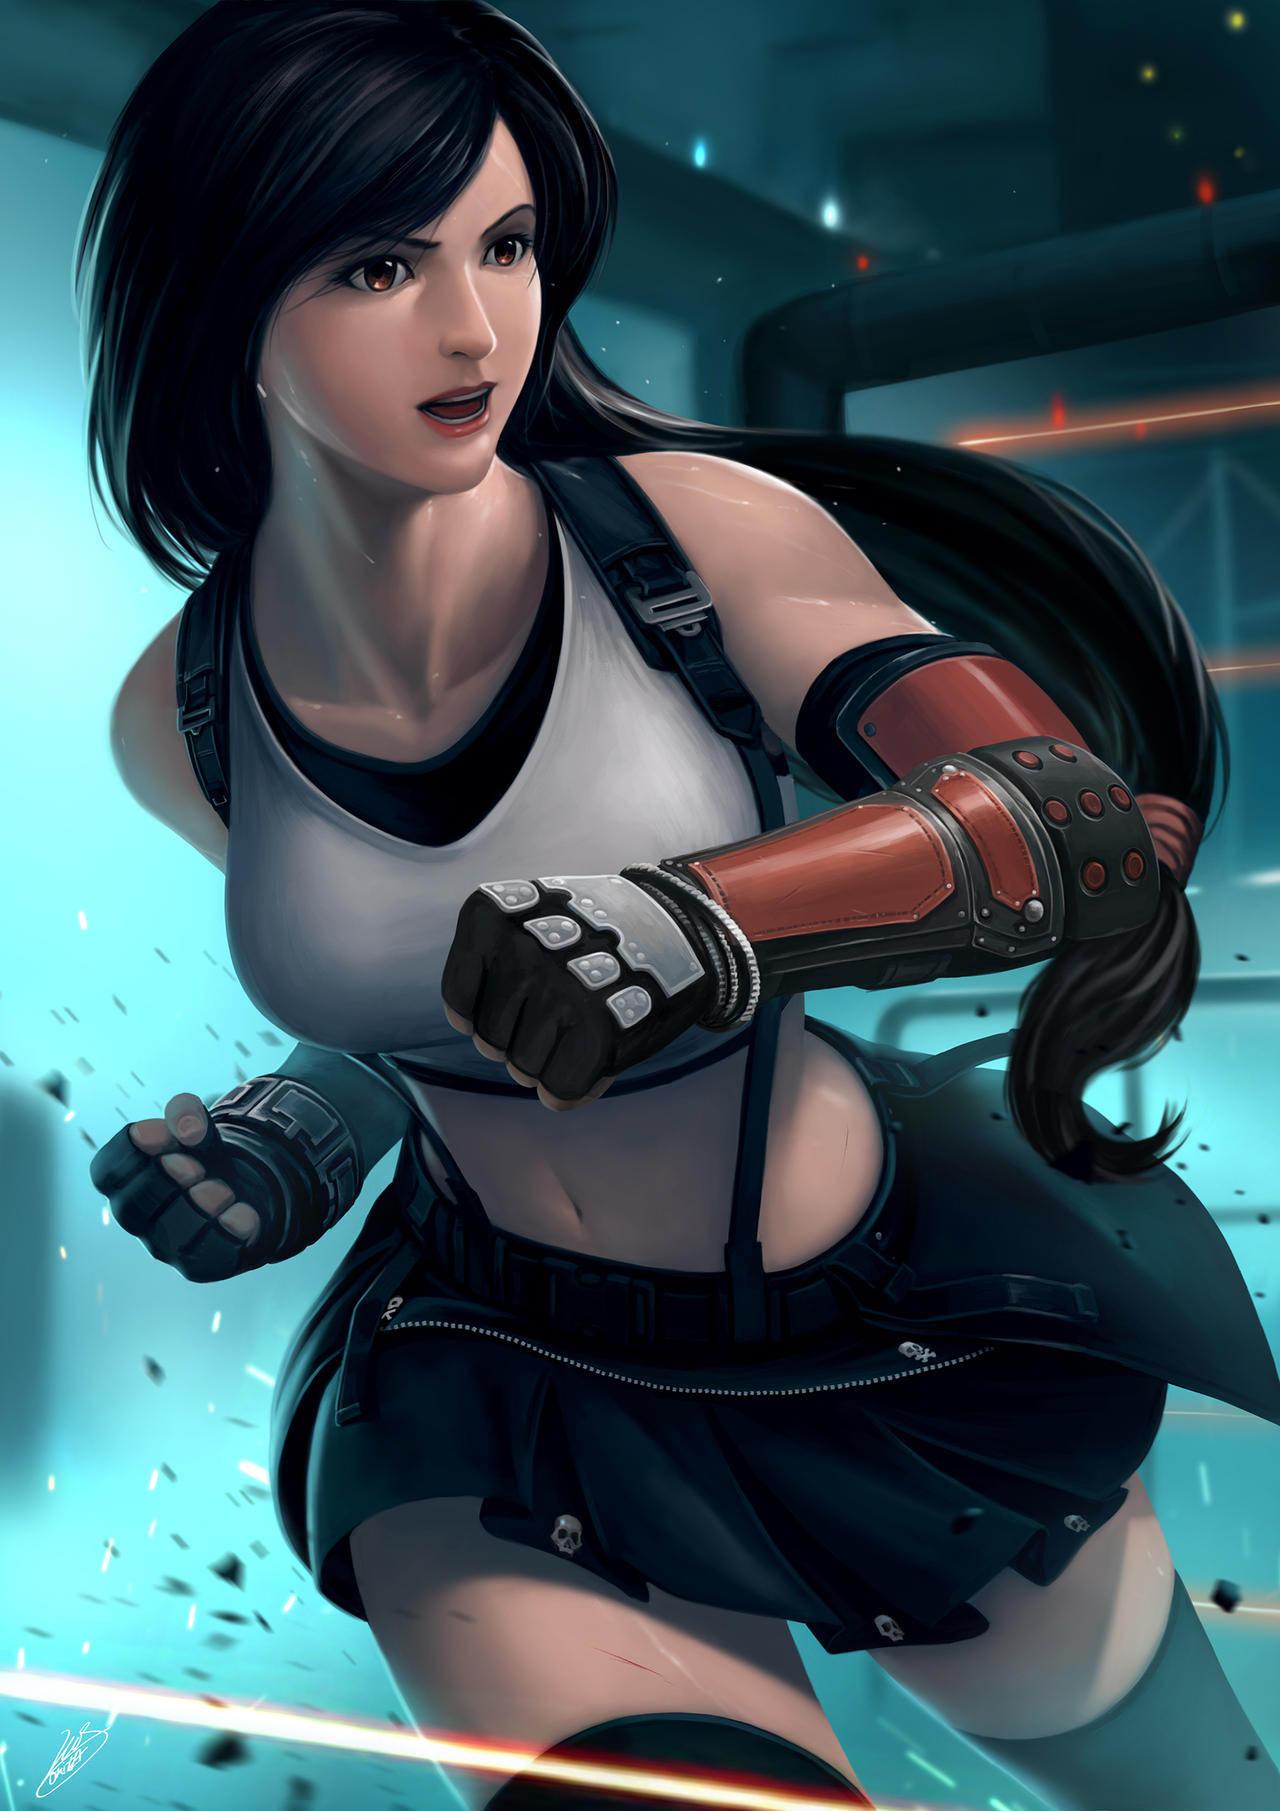 Tifa Lockhart | Final Fantasy VII by renaillusion on